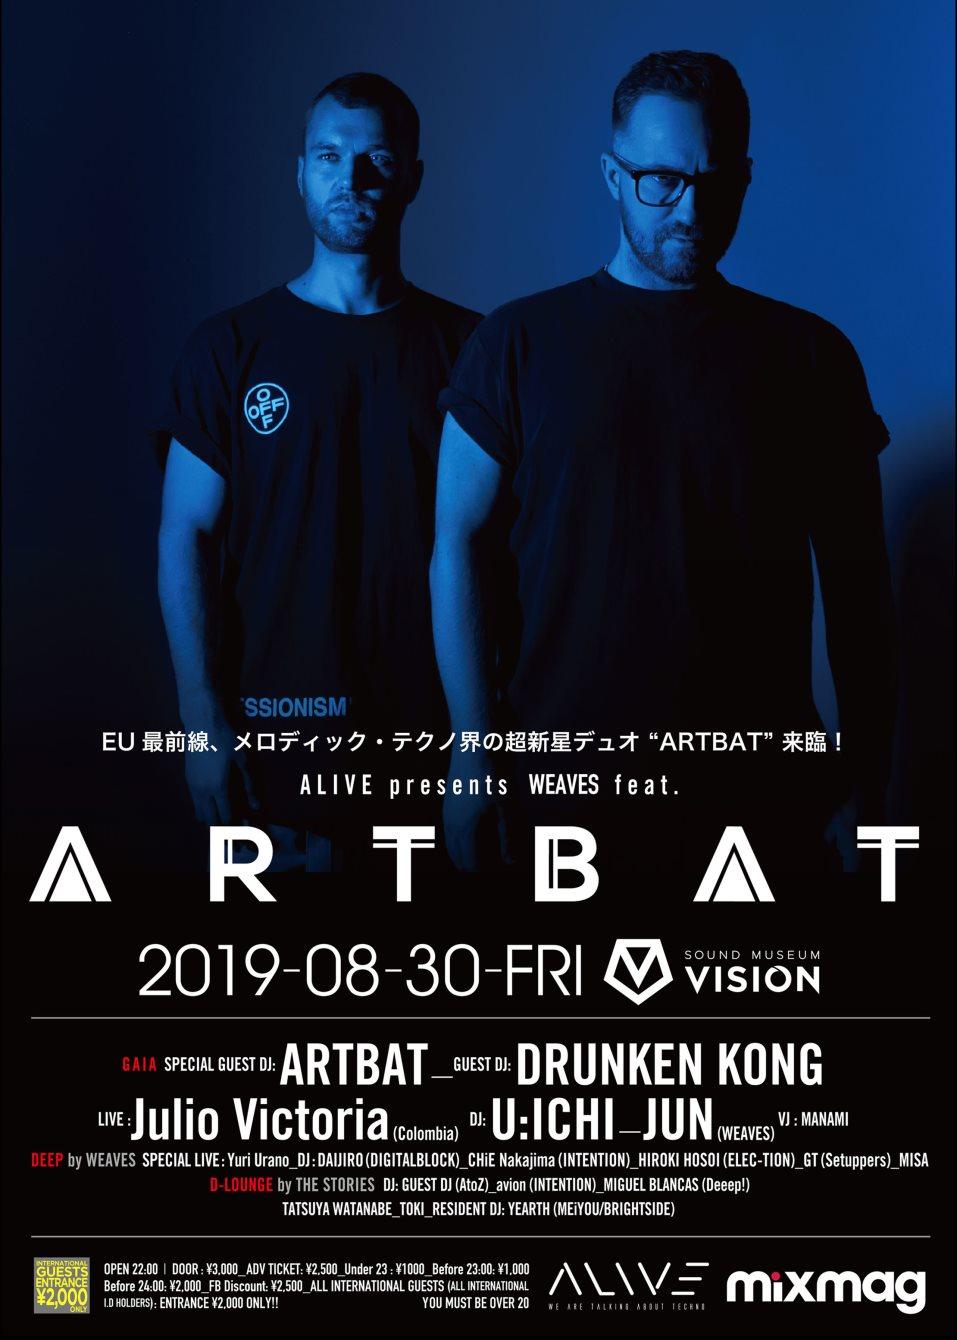 Alive presents Weaves Feat. Artbat - Flyer front